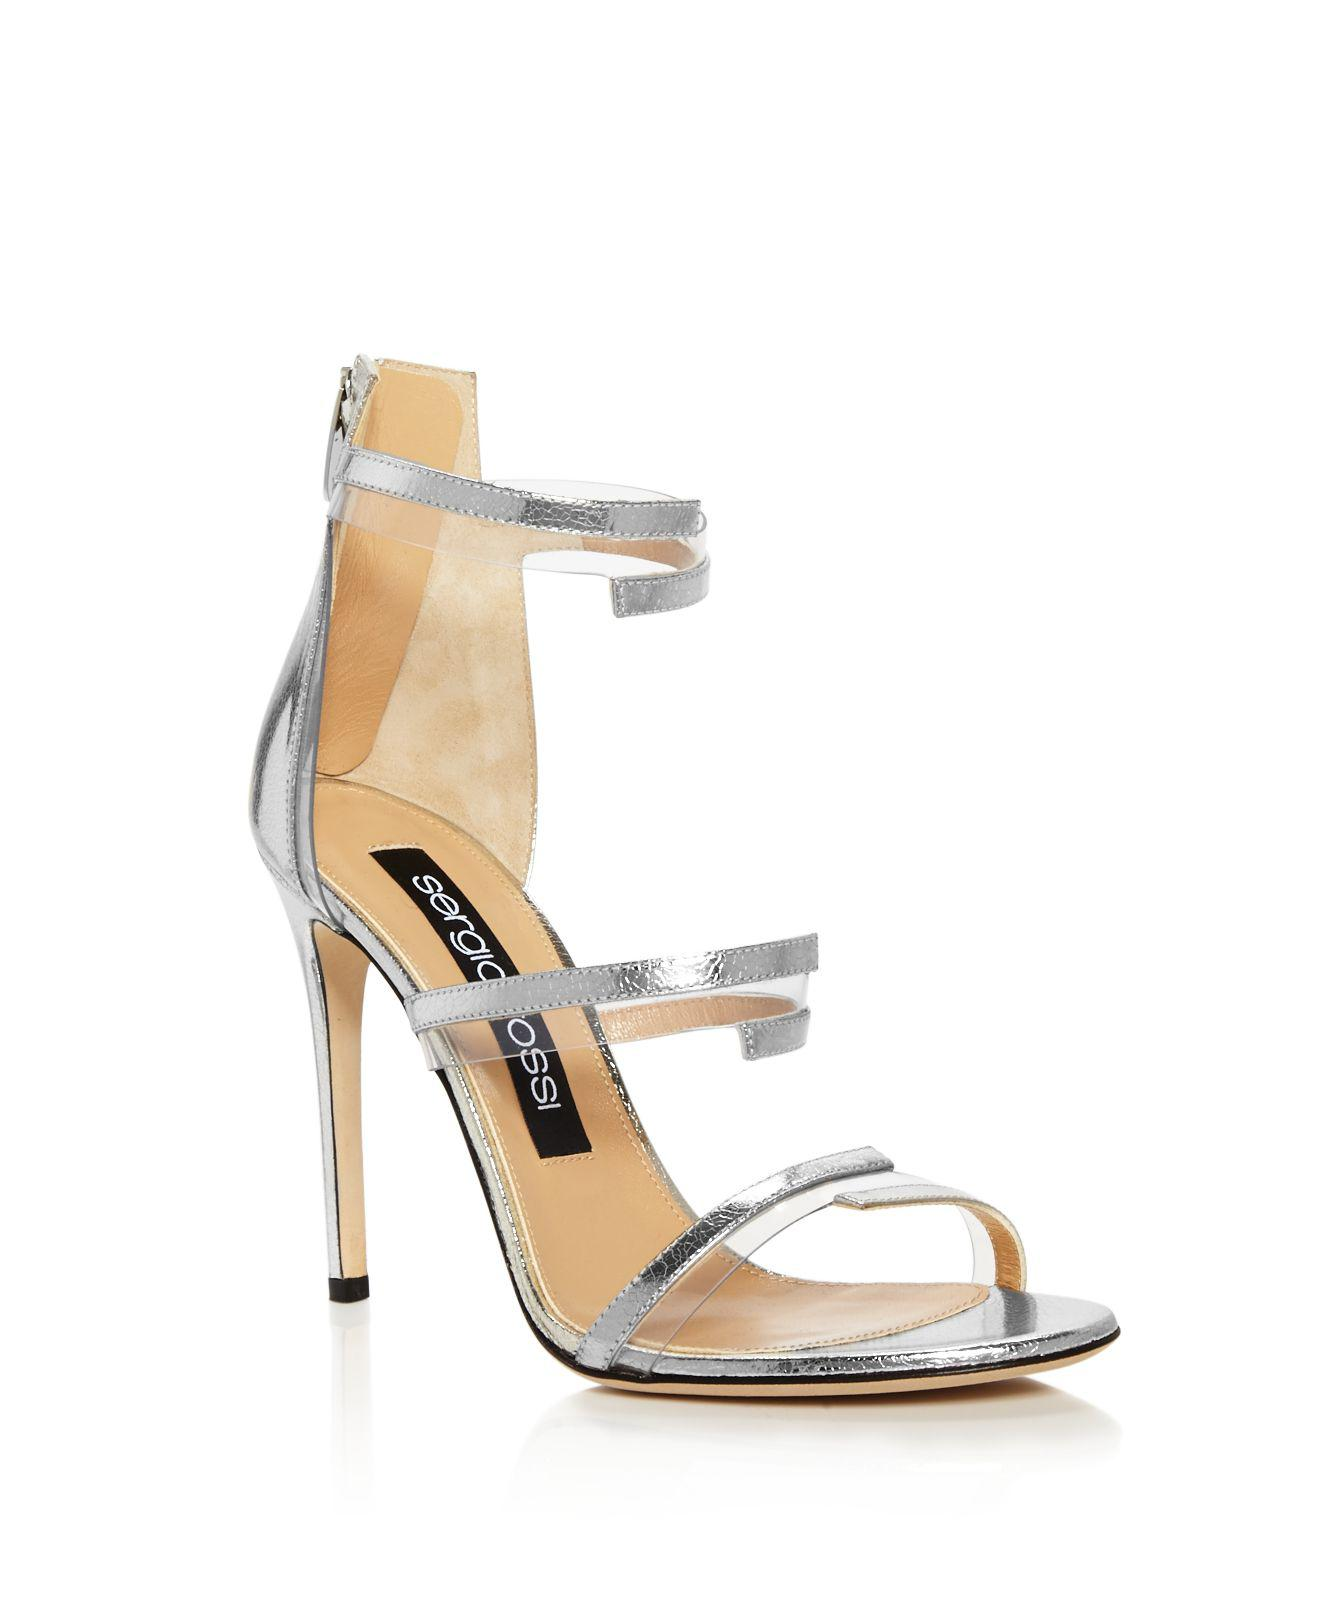 Sergio Rossi Karen Triple Strap Illusion High-Heel Sandals QiB9AIaOKE